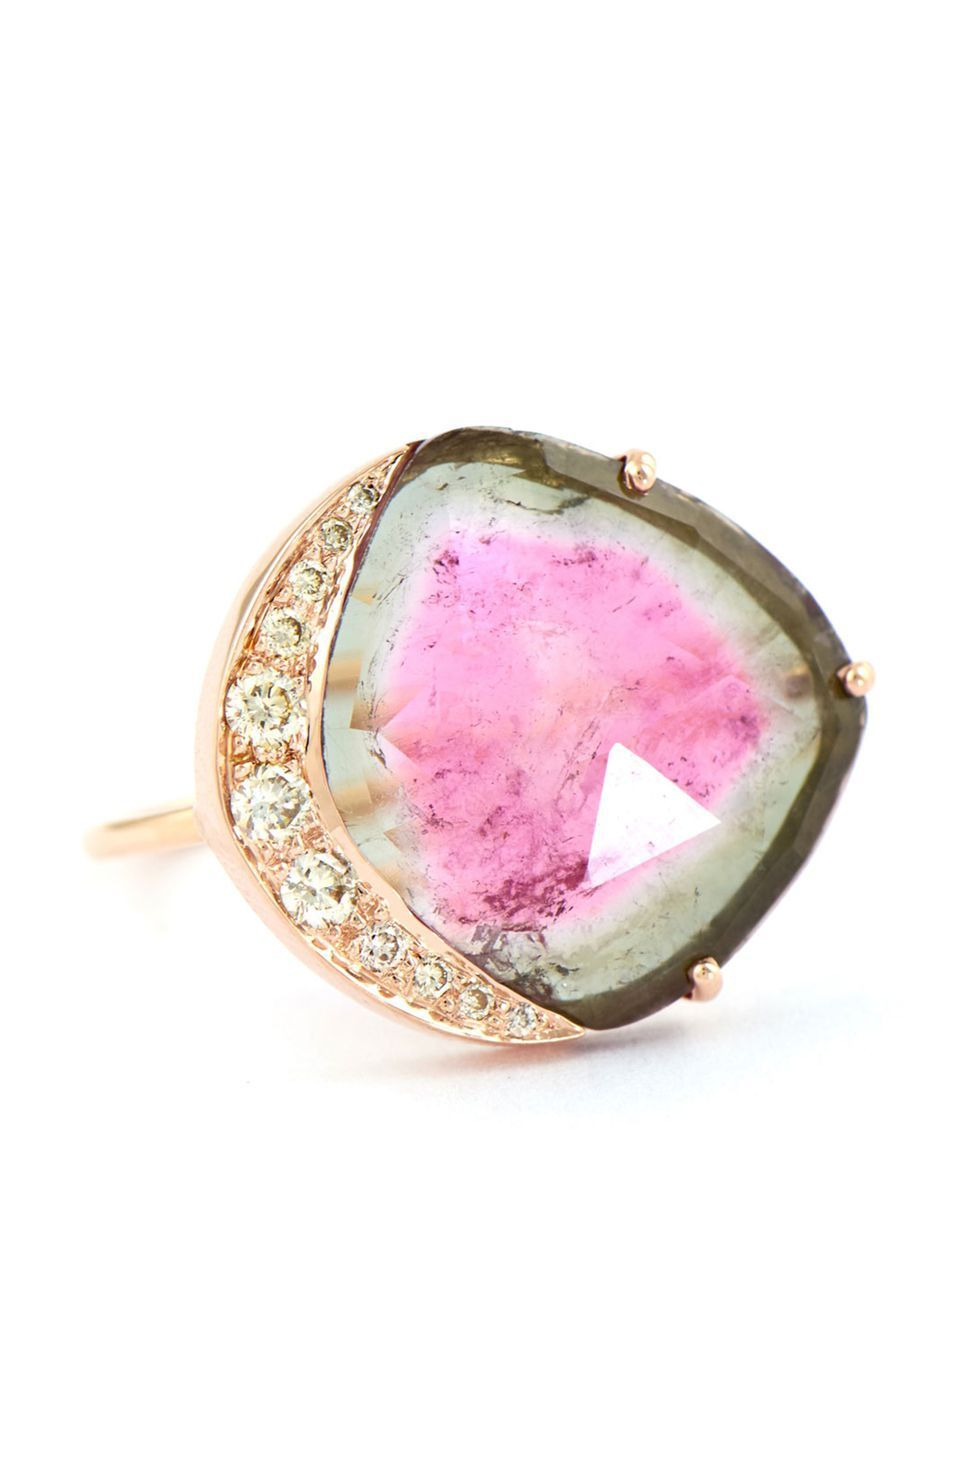 25 Alternative Engagement Rings - Non-Diamond, Unconventional ...